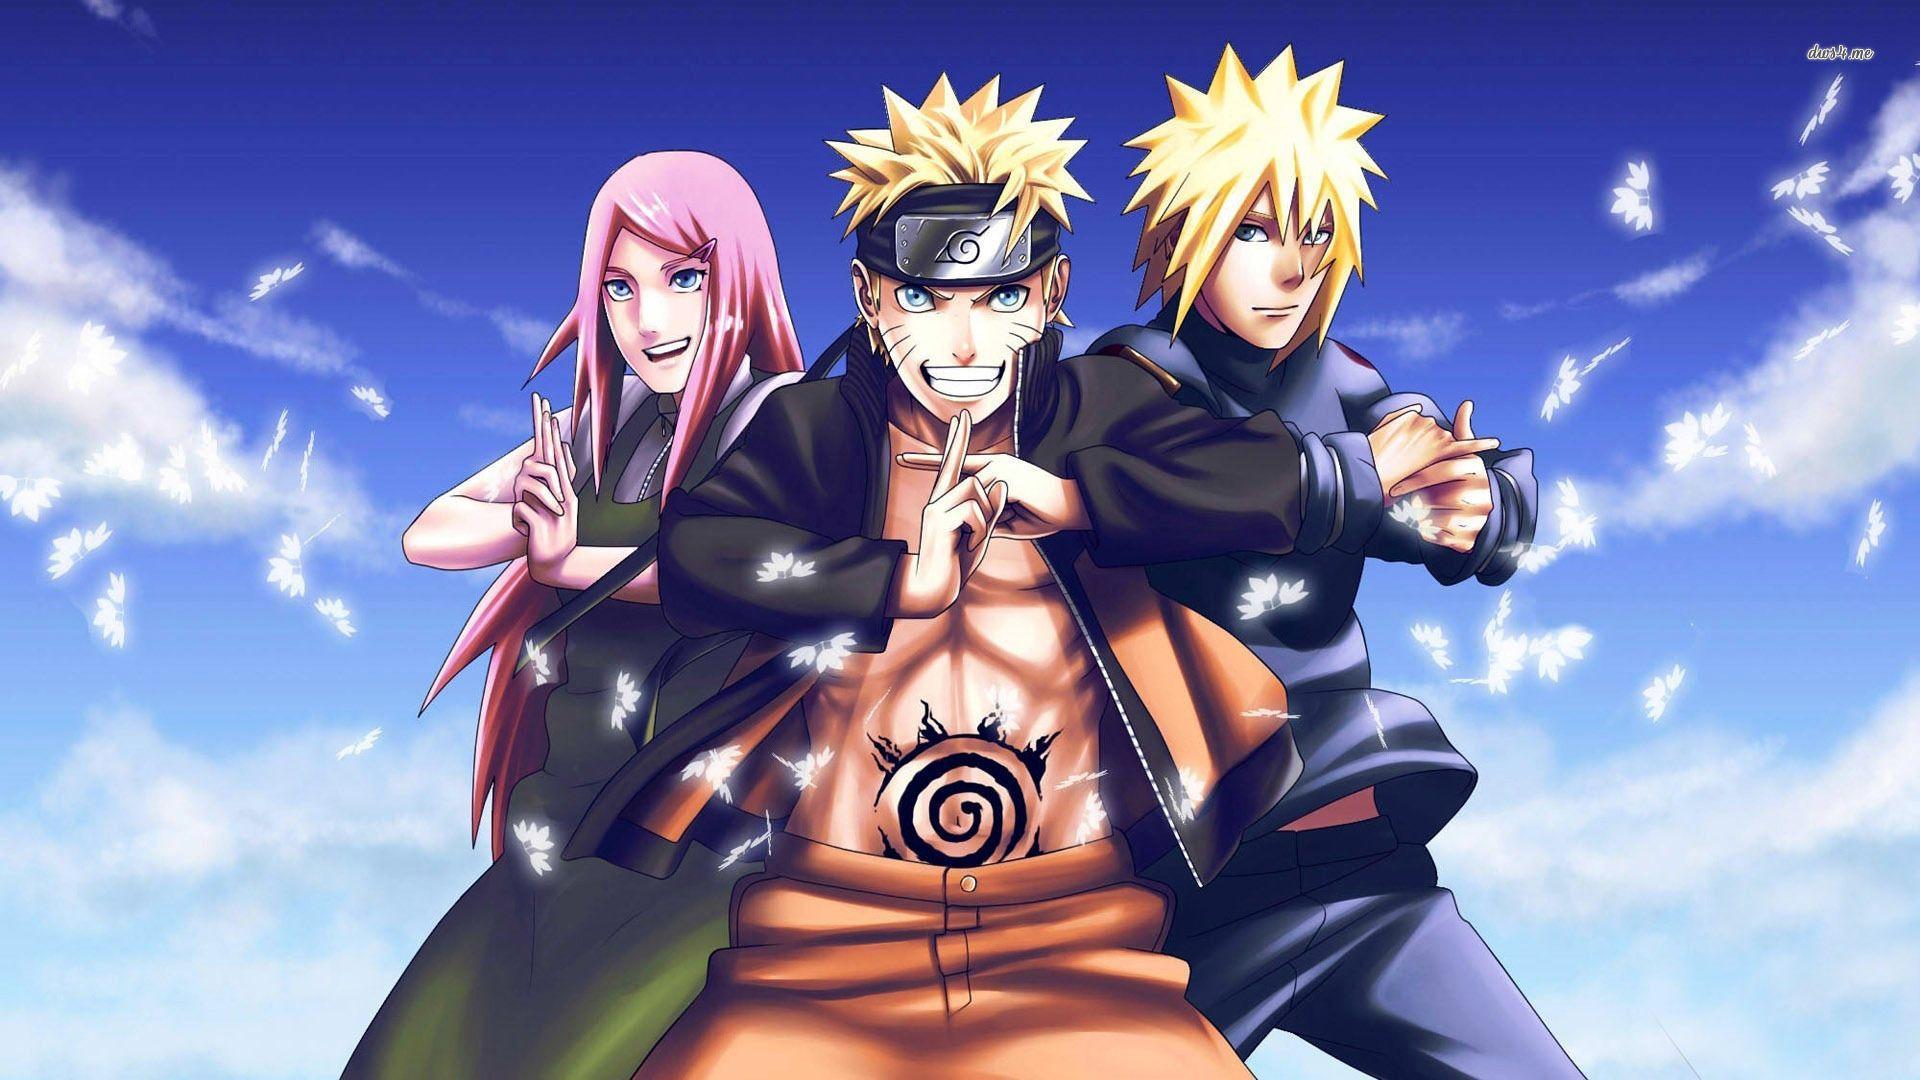 Naruto Shippuden Wallpaper Wall Newssup Com